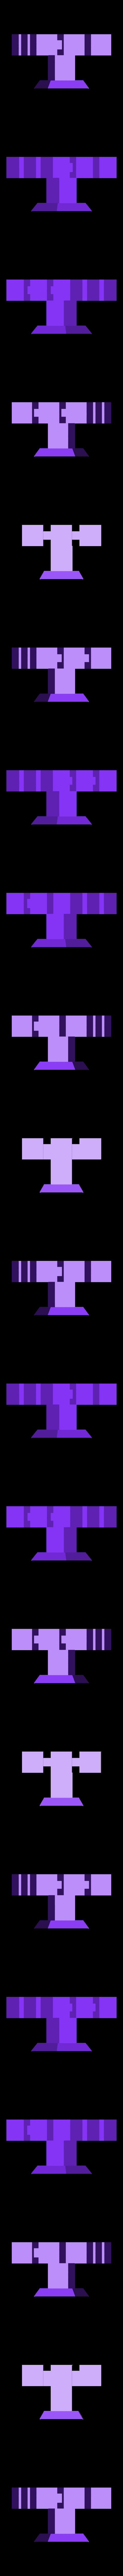 "candelabro de 9i.STL Download free STL file Chandelier ""Prometeo"" REversible • 3D printable template, memoretirado"